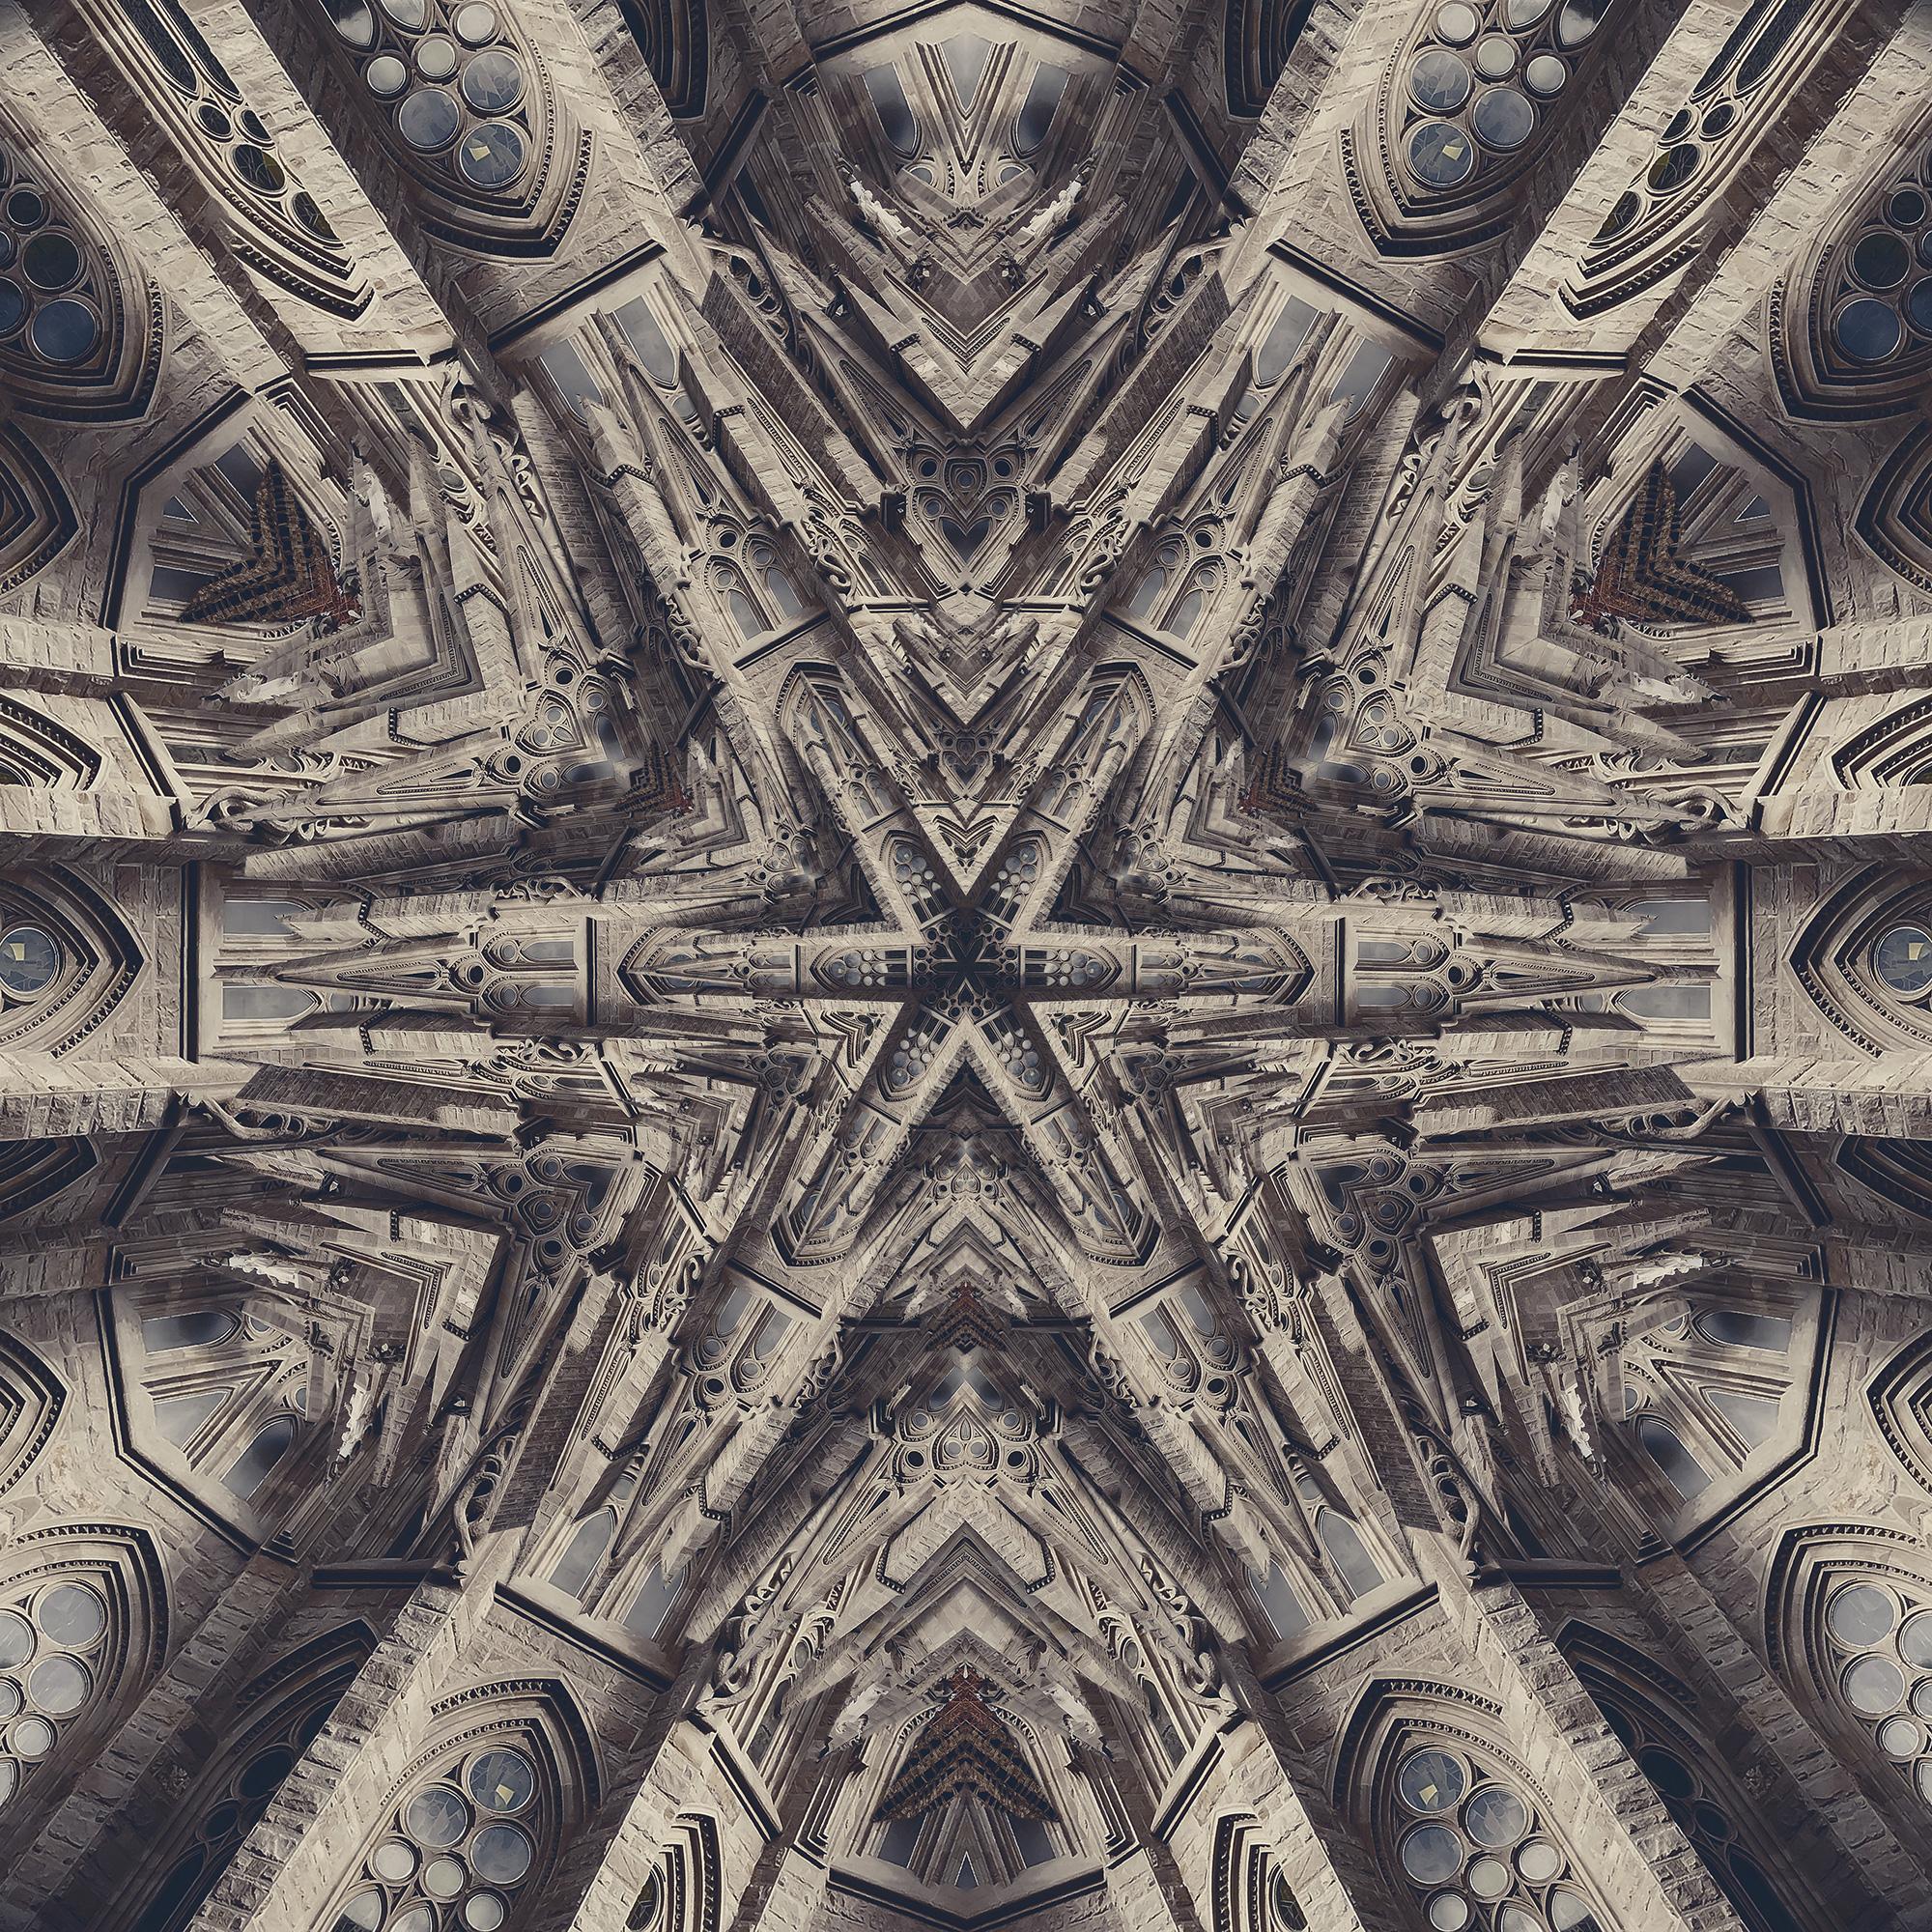 Kaleidoskope Cathedral I